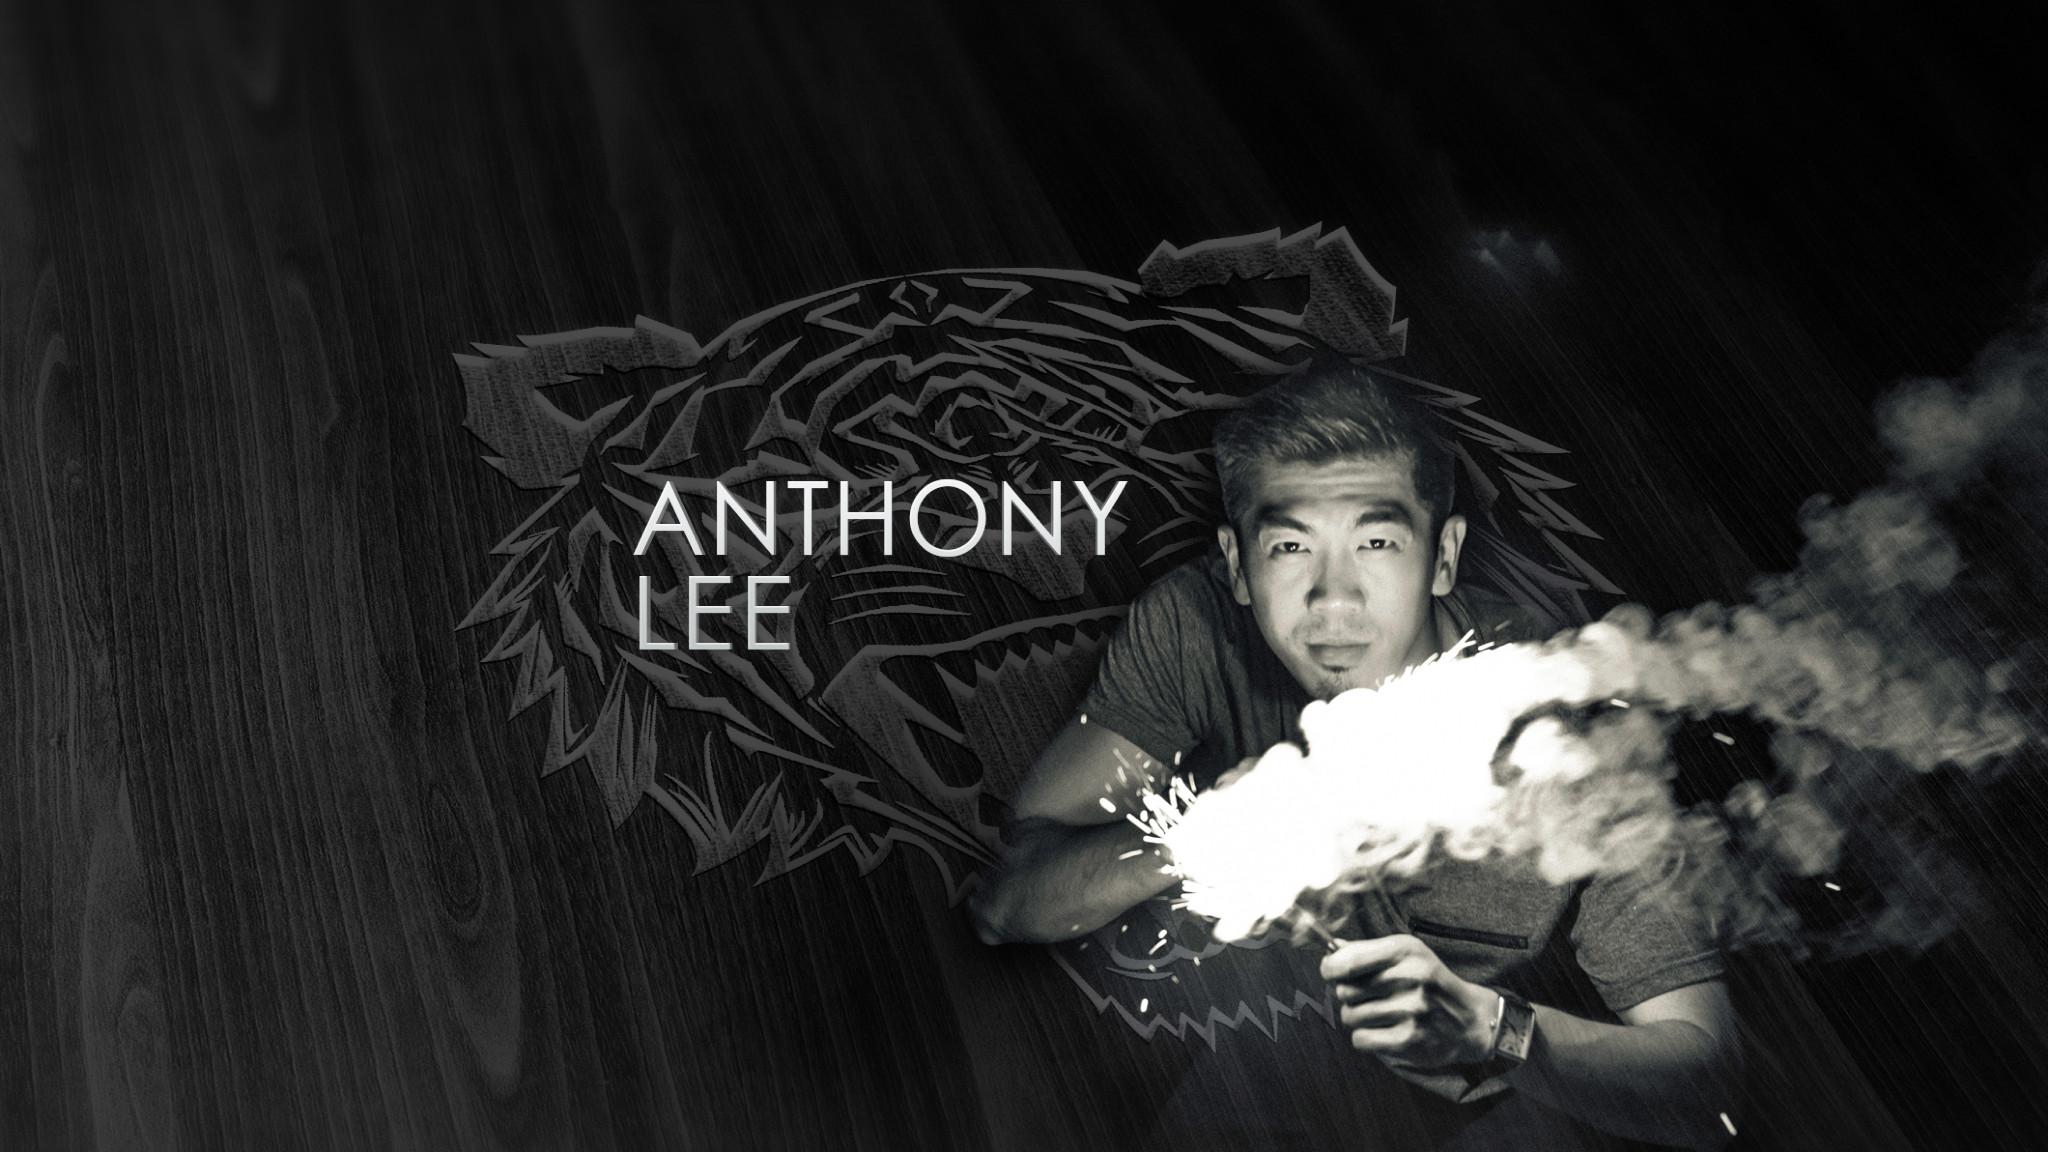 anthony lee yt banner test HD Wallpaper